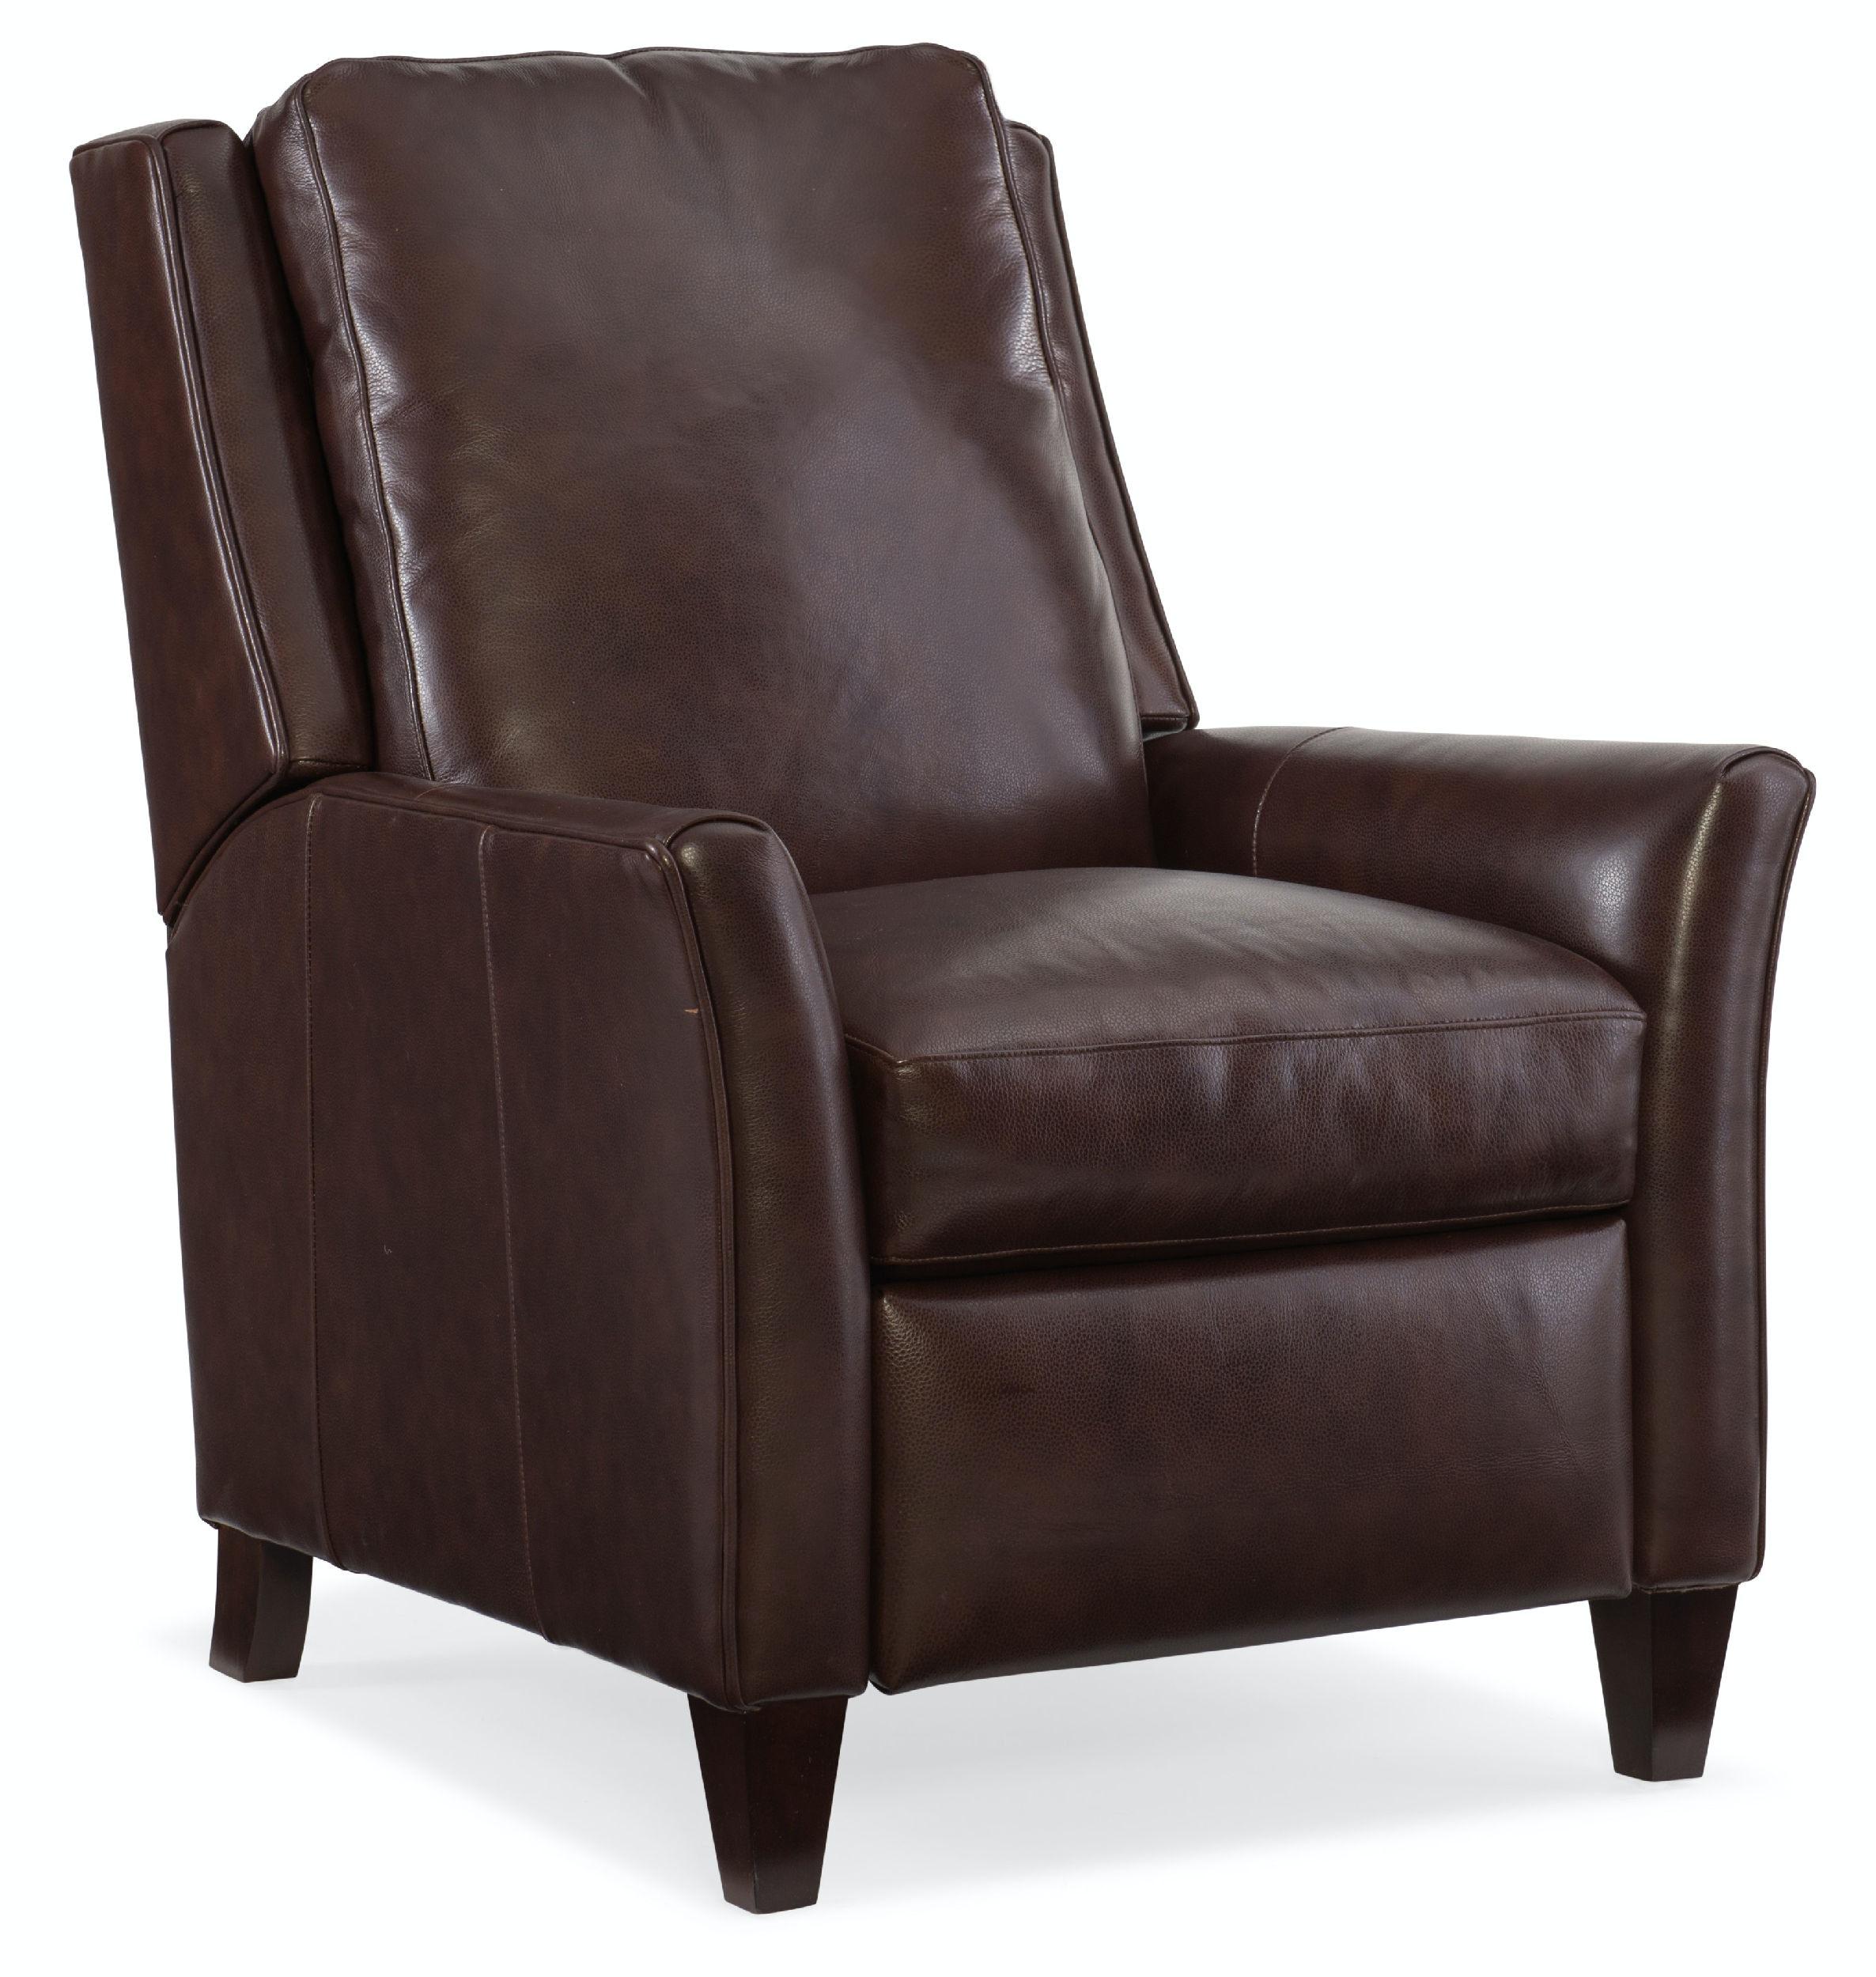 Bradington Young Furniture 5009 Living Room Gunner Recliner